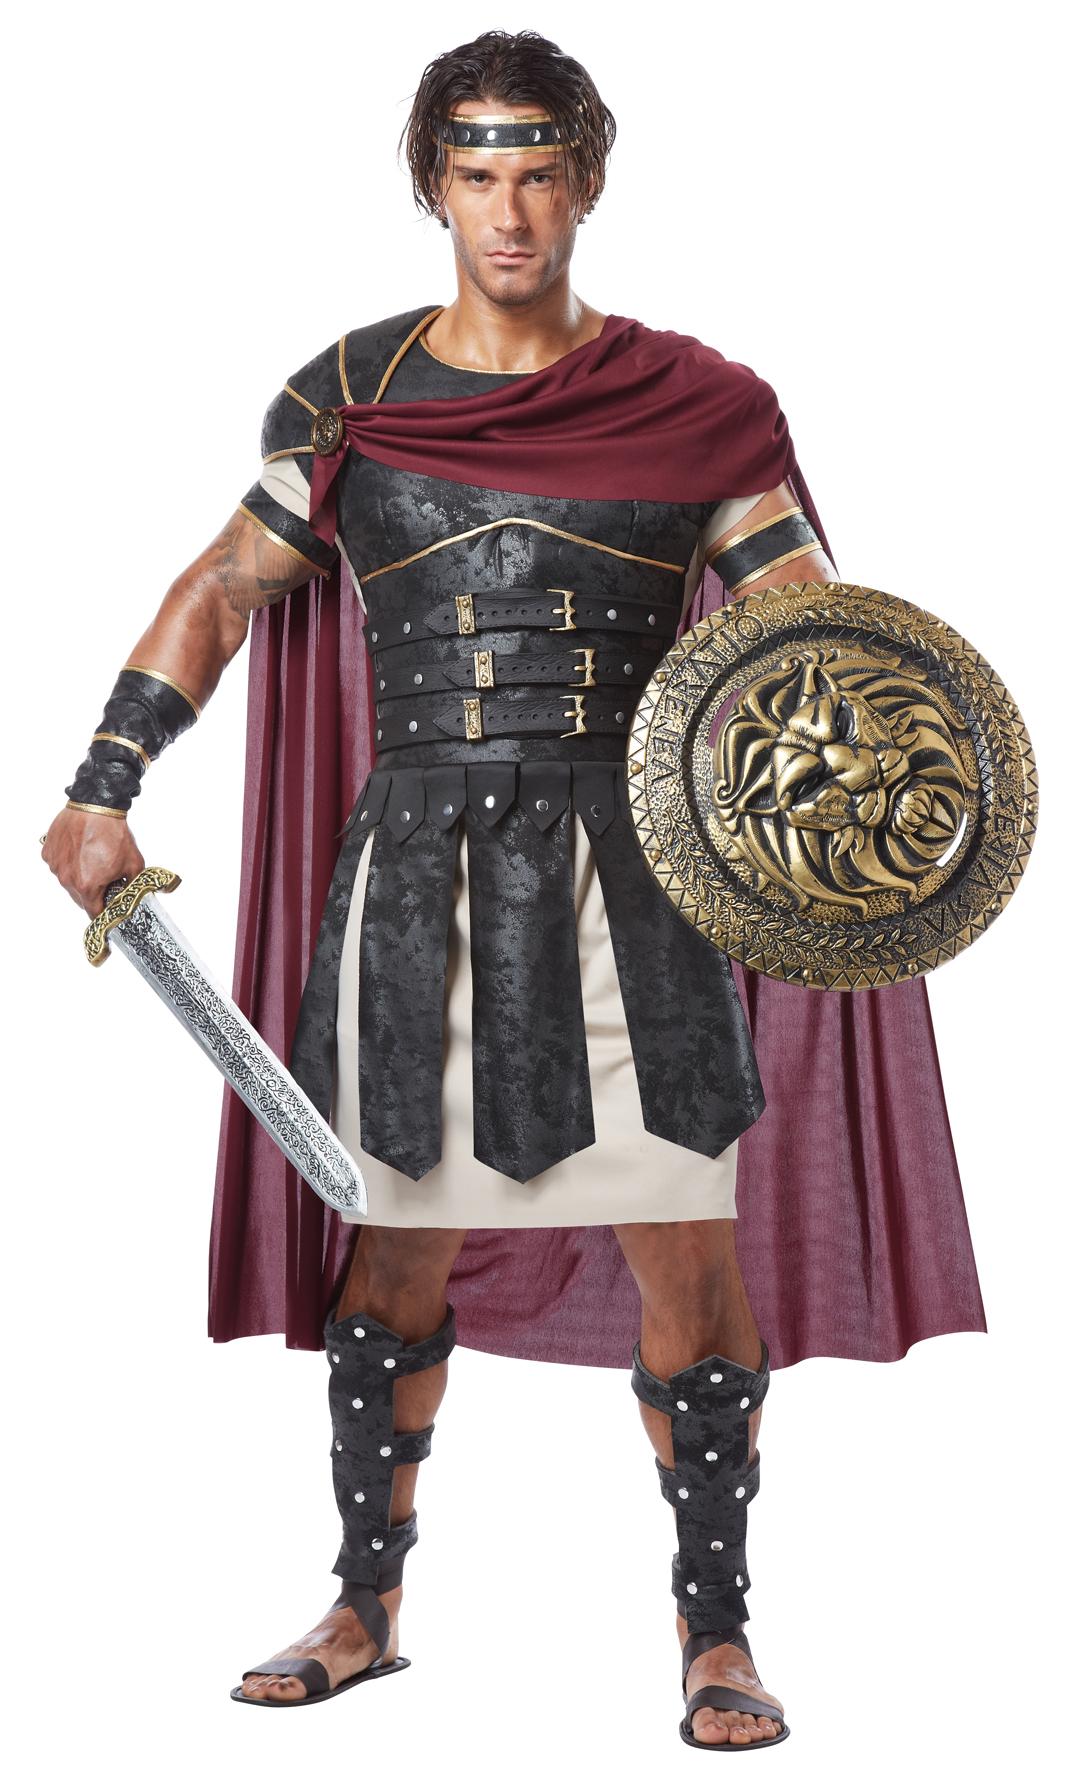 Ifavor123com Mens Roman Gladiator Greek Soldier Halloween Costume Set Cape Tunic Body Armor